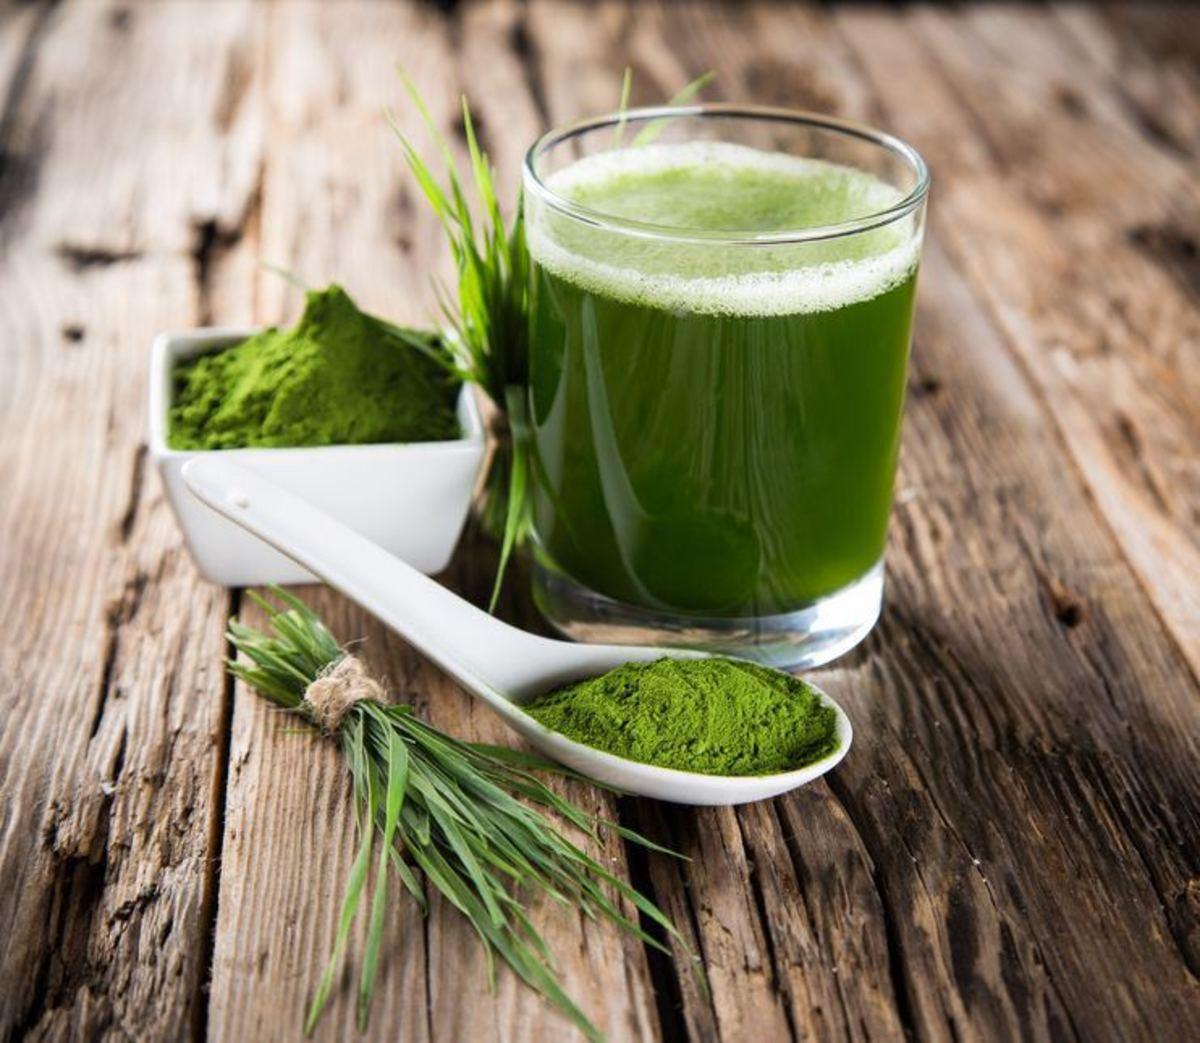 The Wonderful Wheatgrass Powder Health Benefits